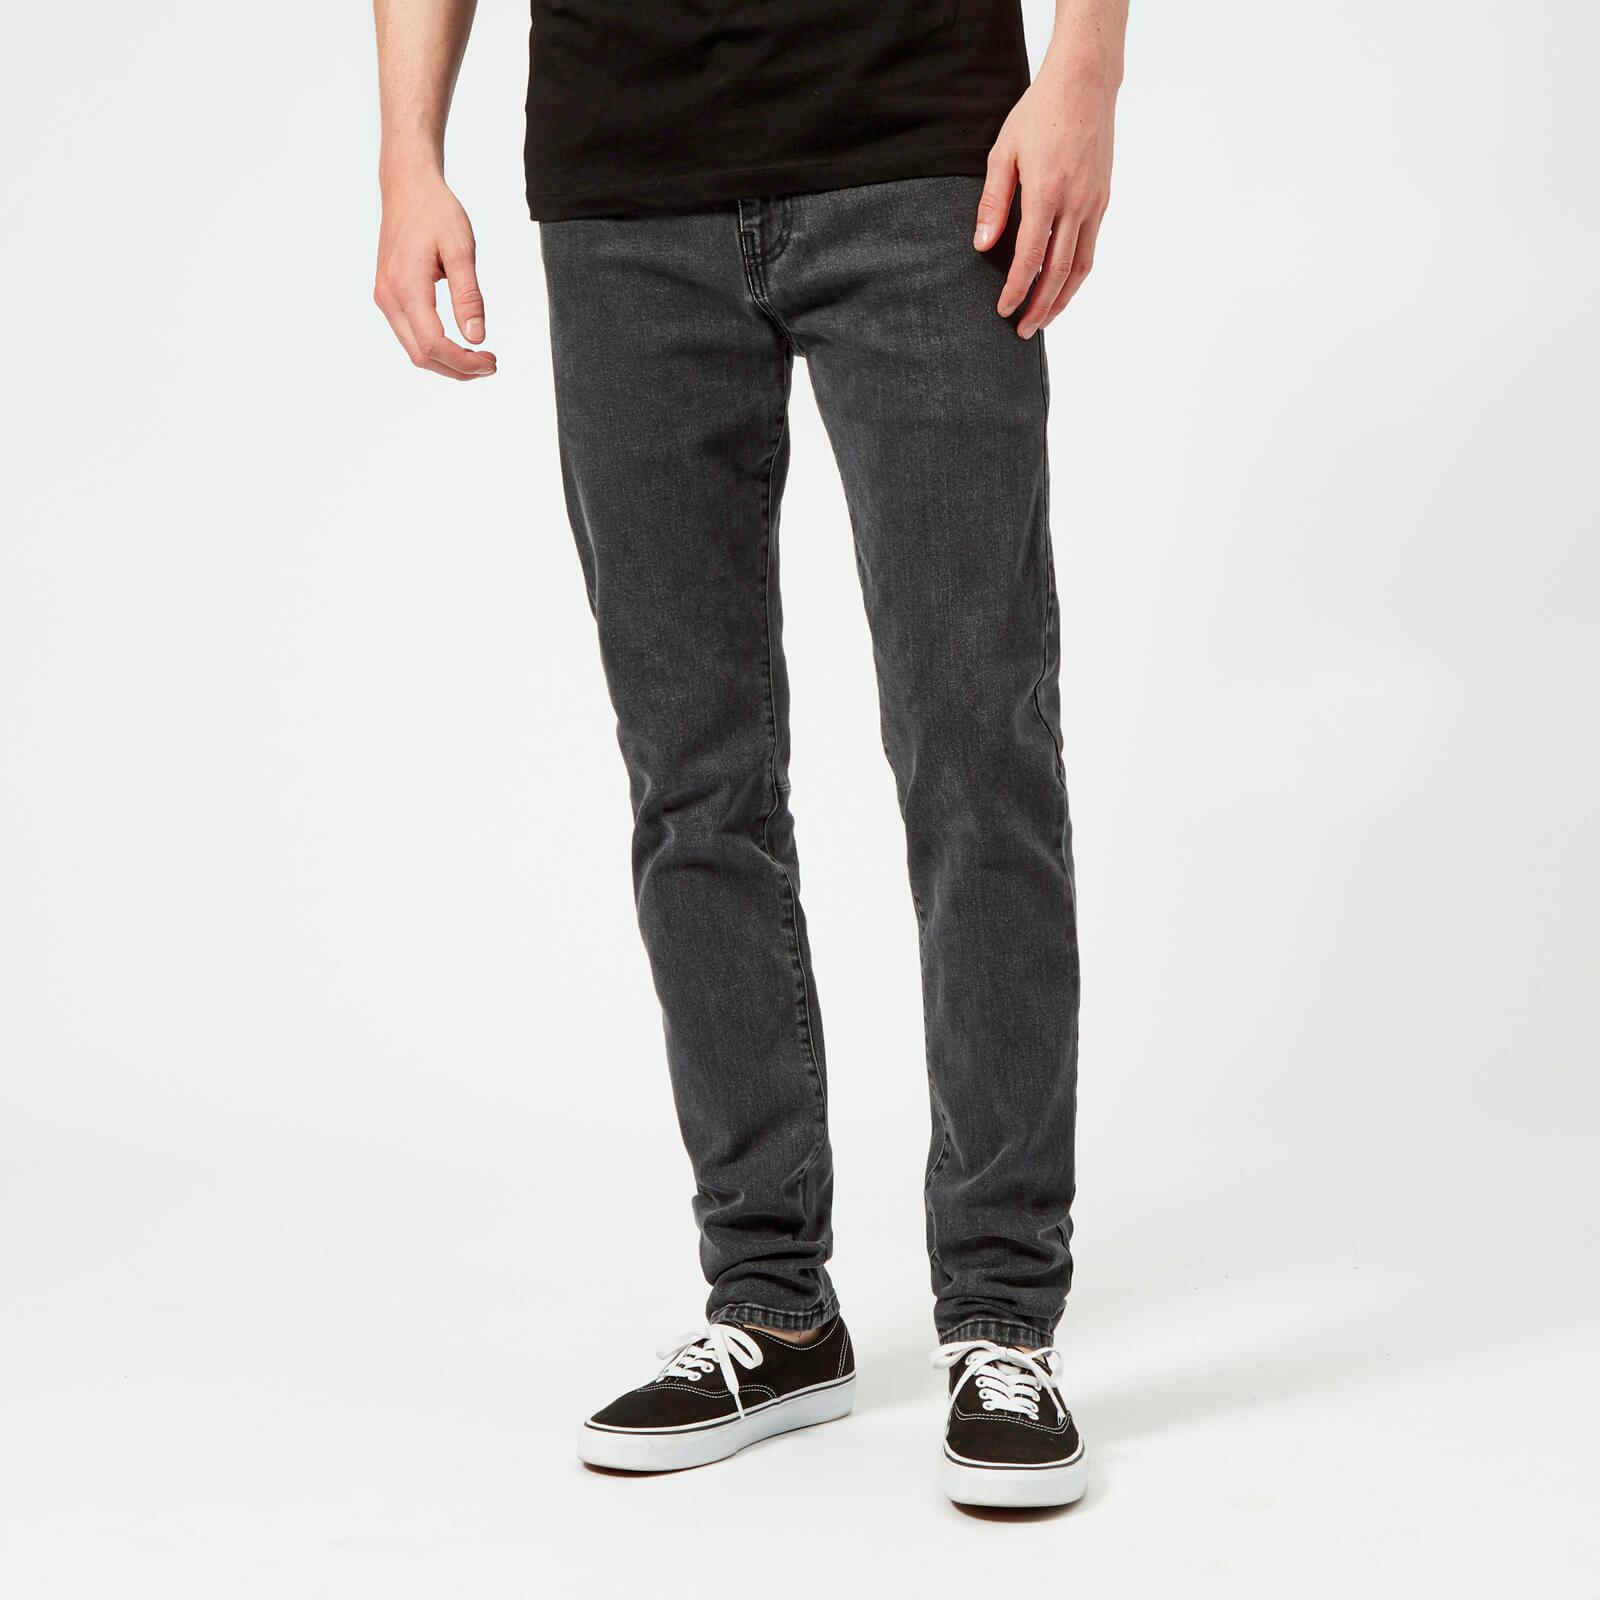 uk availability 319a5 97cfb McQ Alexander McQueen Men's Mismatched Strummer Jeans - Grey Denim